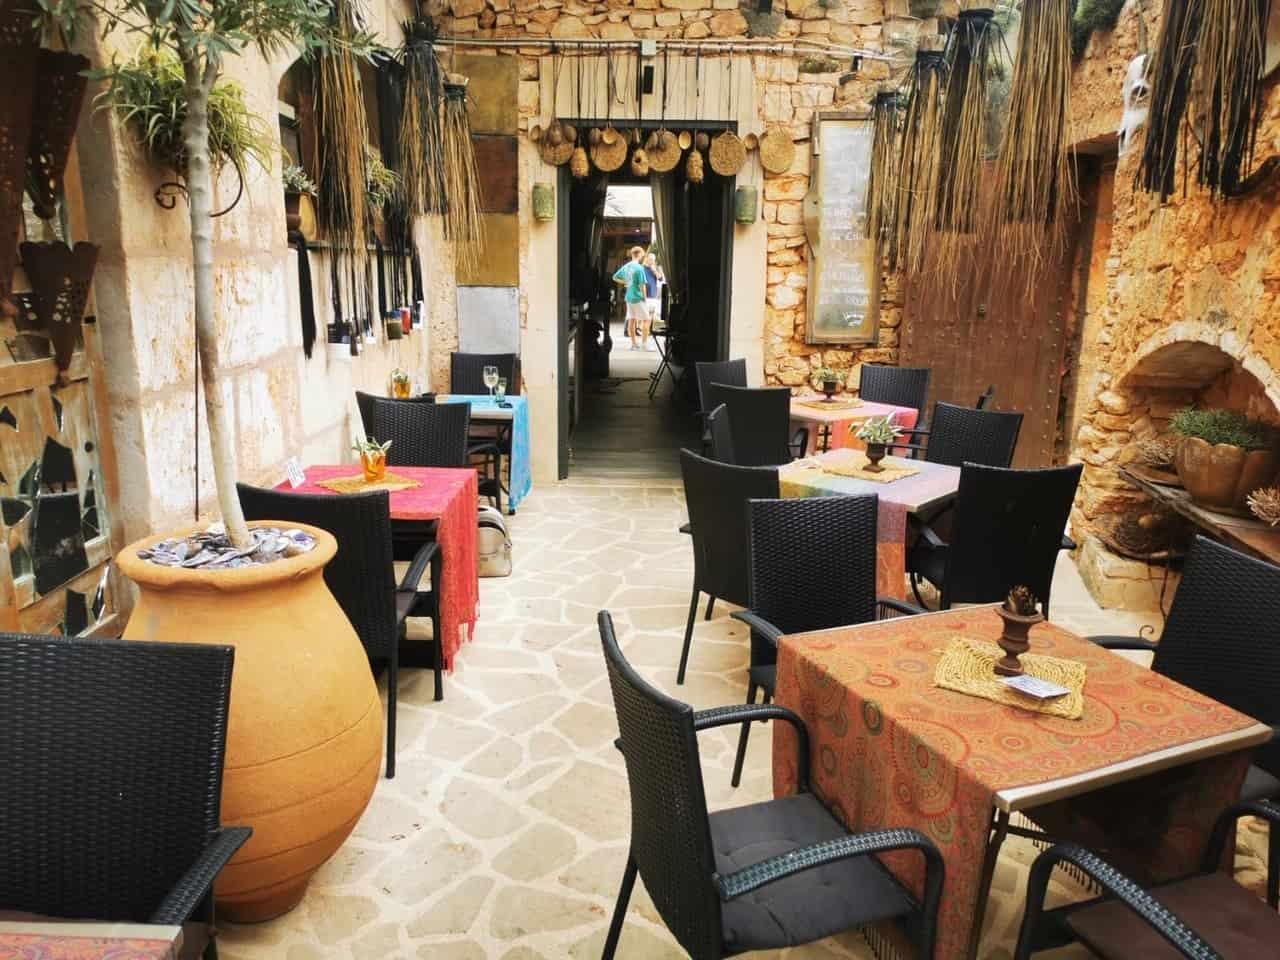 Innenhof-Pacio vom Restaurant Goli in Santanyi